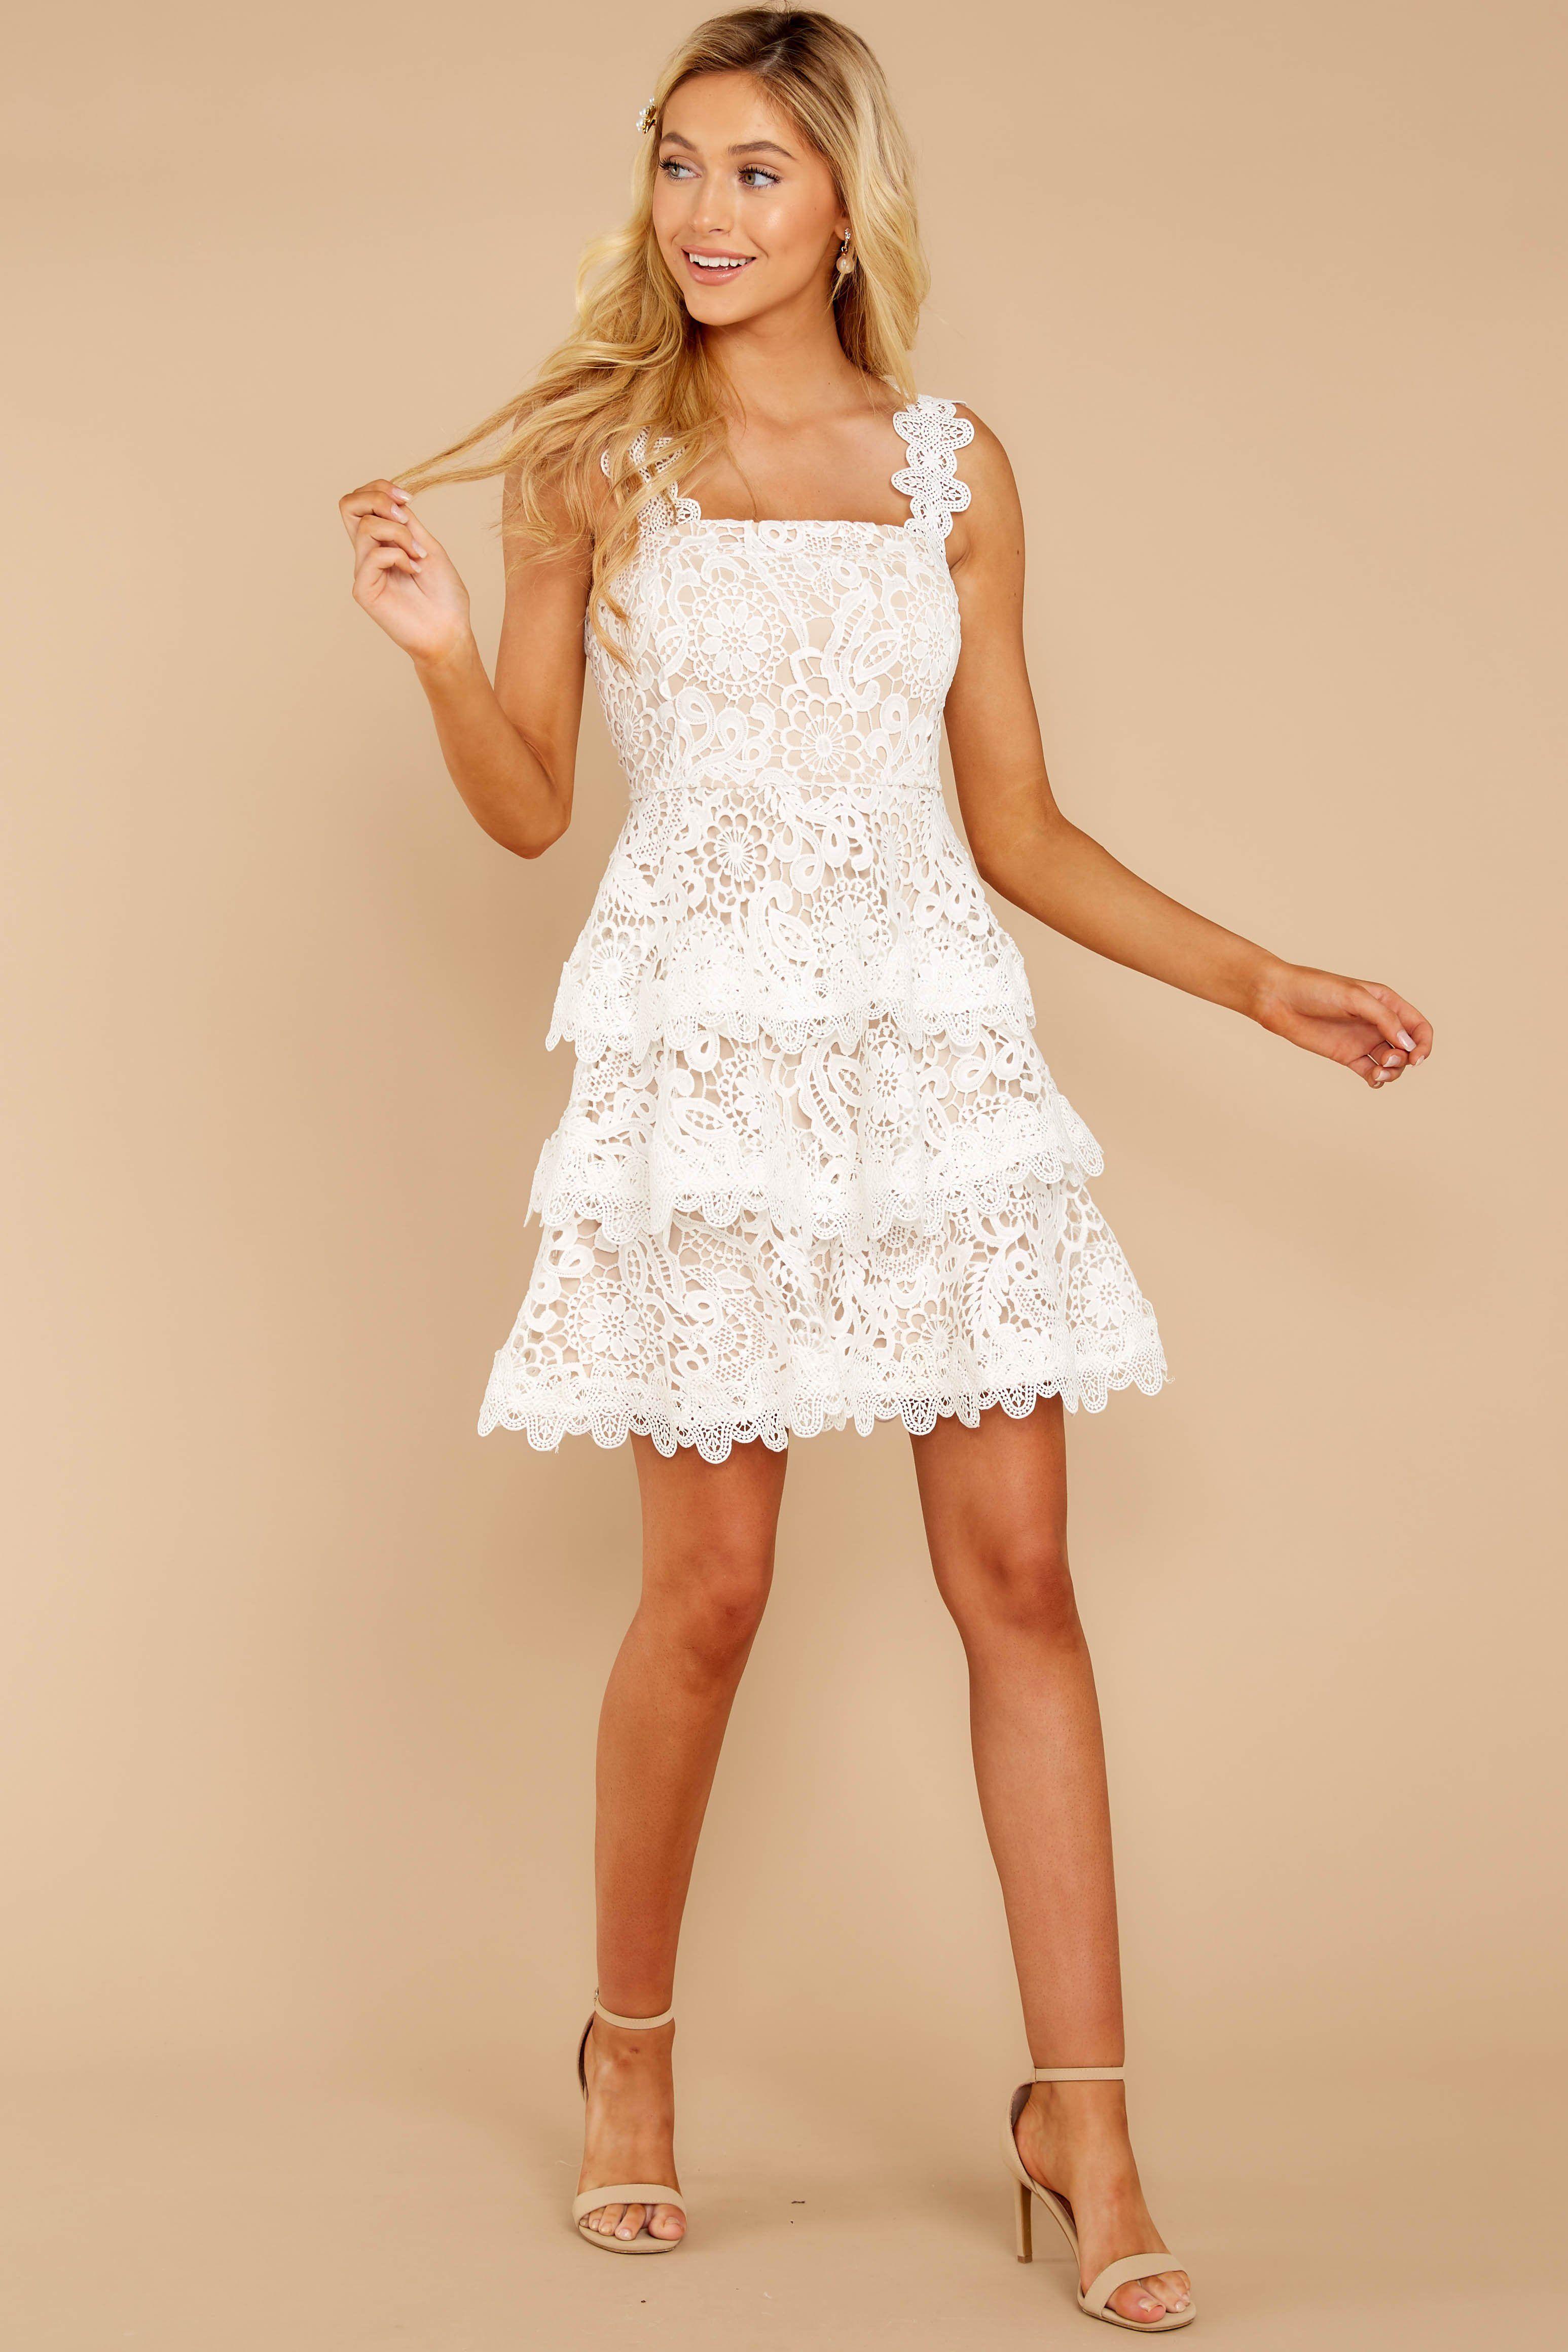 Gorgeous White Lace Dress Short Tiered Lace Dress Dress 64 00 Short Lace Wedding Dress Short Lace Dress Lace White Dress [ 4639 x 3093 Pixel ]